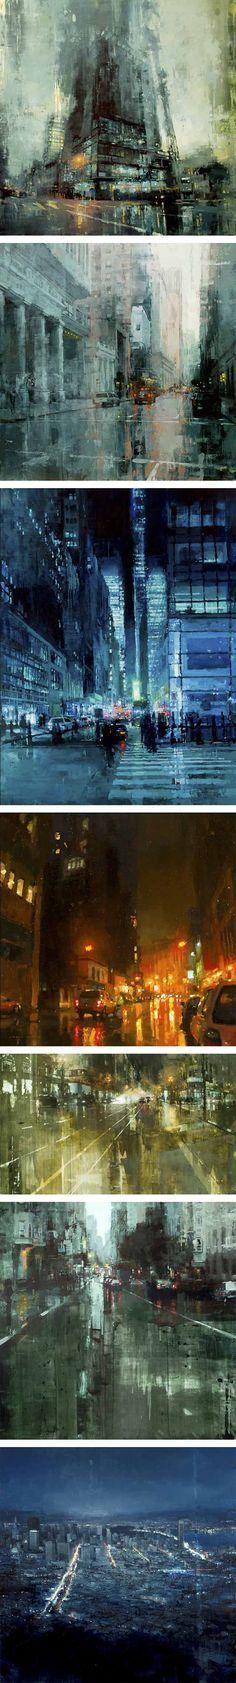 Jeremy Mann, pintor destacado por La Gran Imprenta Online